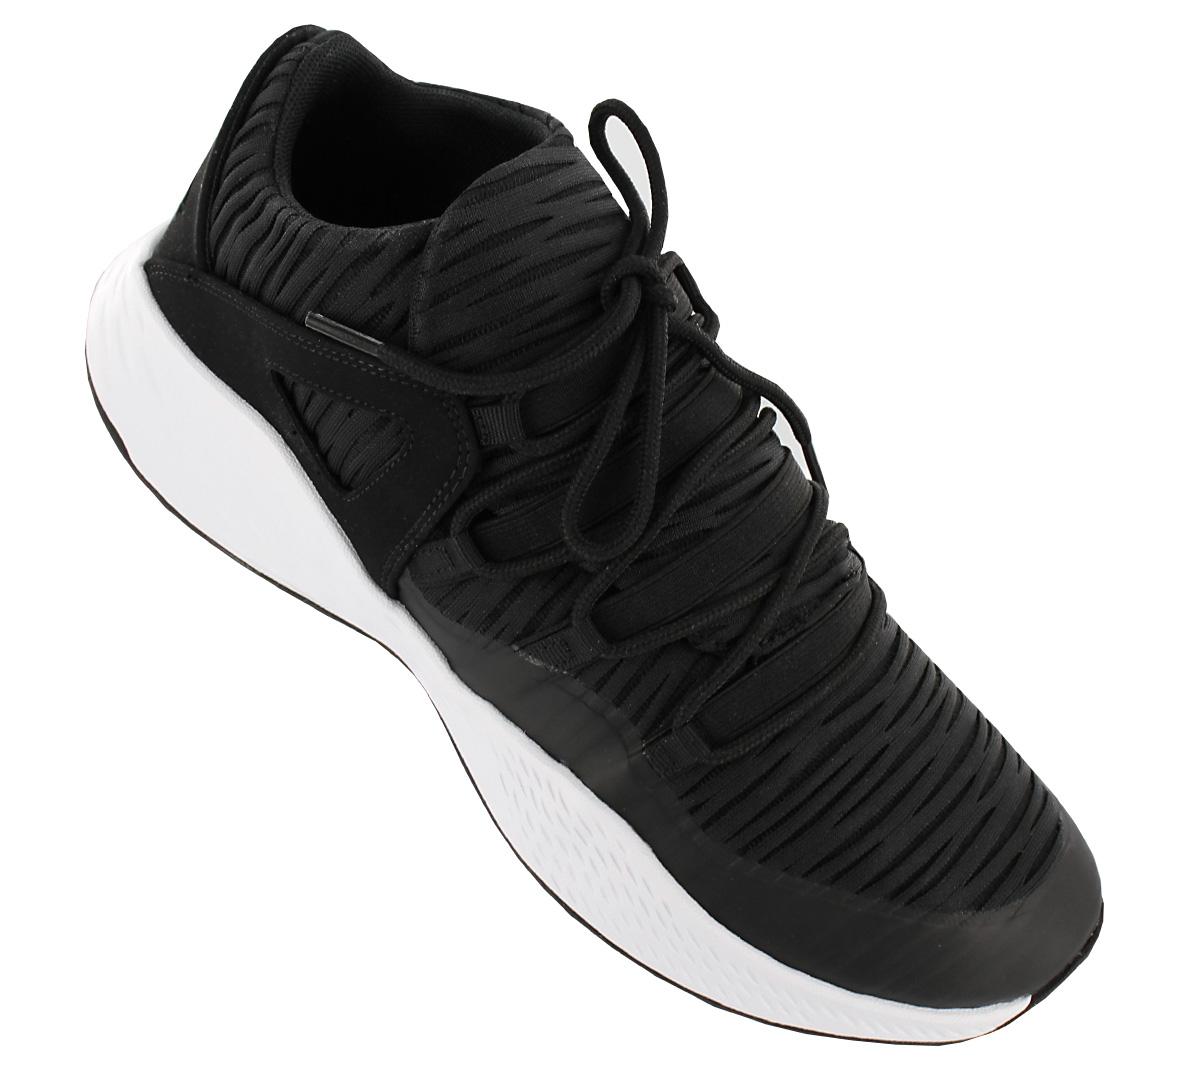 5452d3fc30f127 Nike Air Jordan Formula 23 Low Men s Trainers Shoes 919724 011 New ...